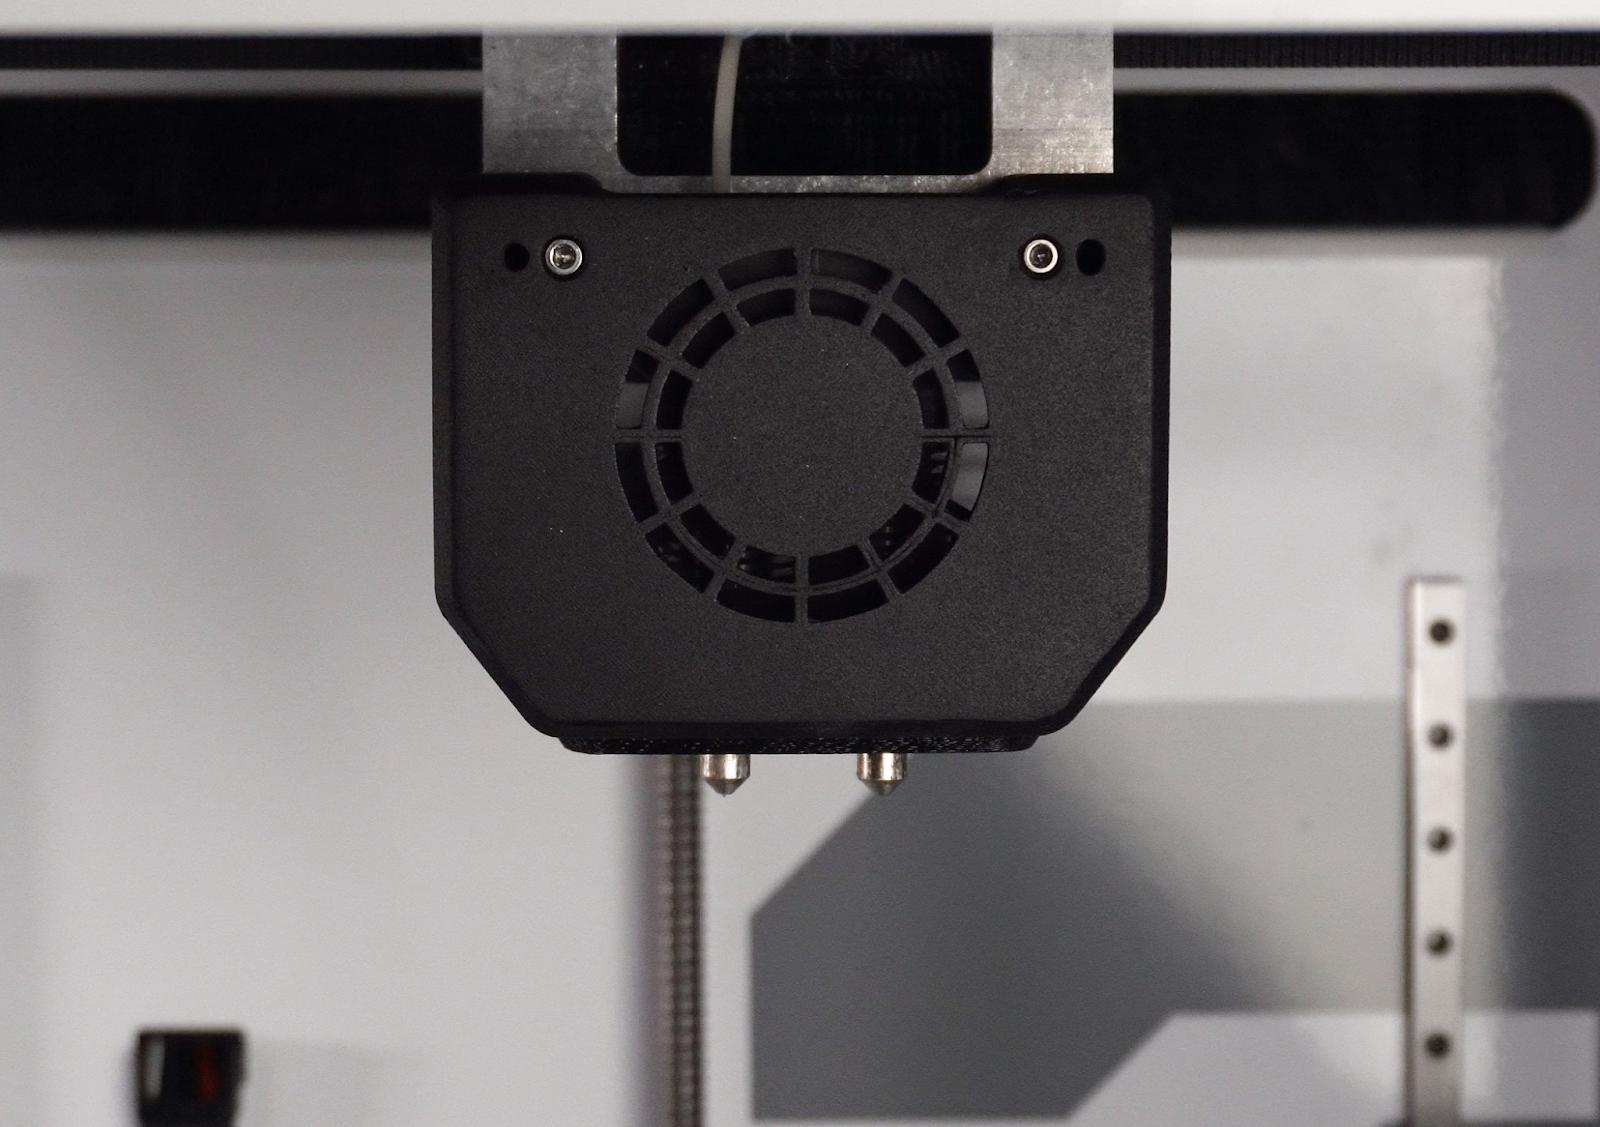 The dual hot end setup found on the EVO, EVO 22, and EVO R line of 3D printer